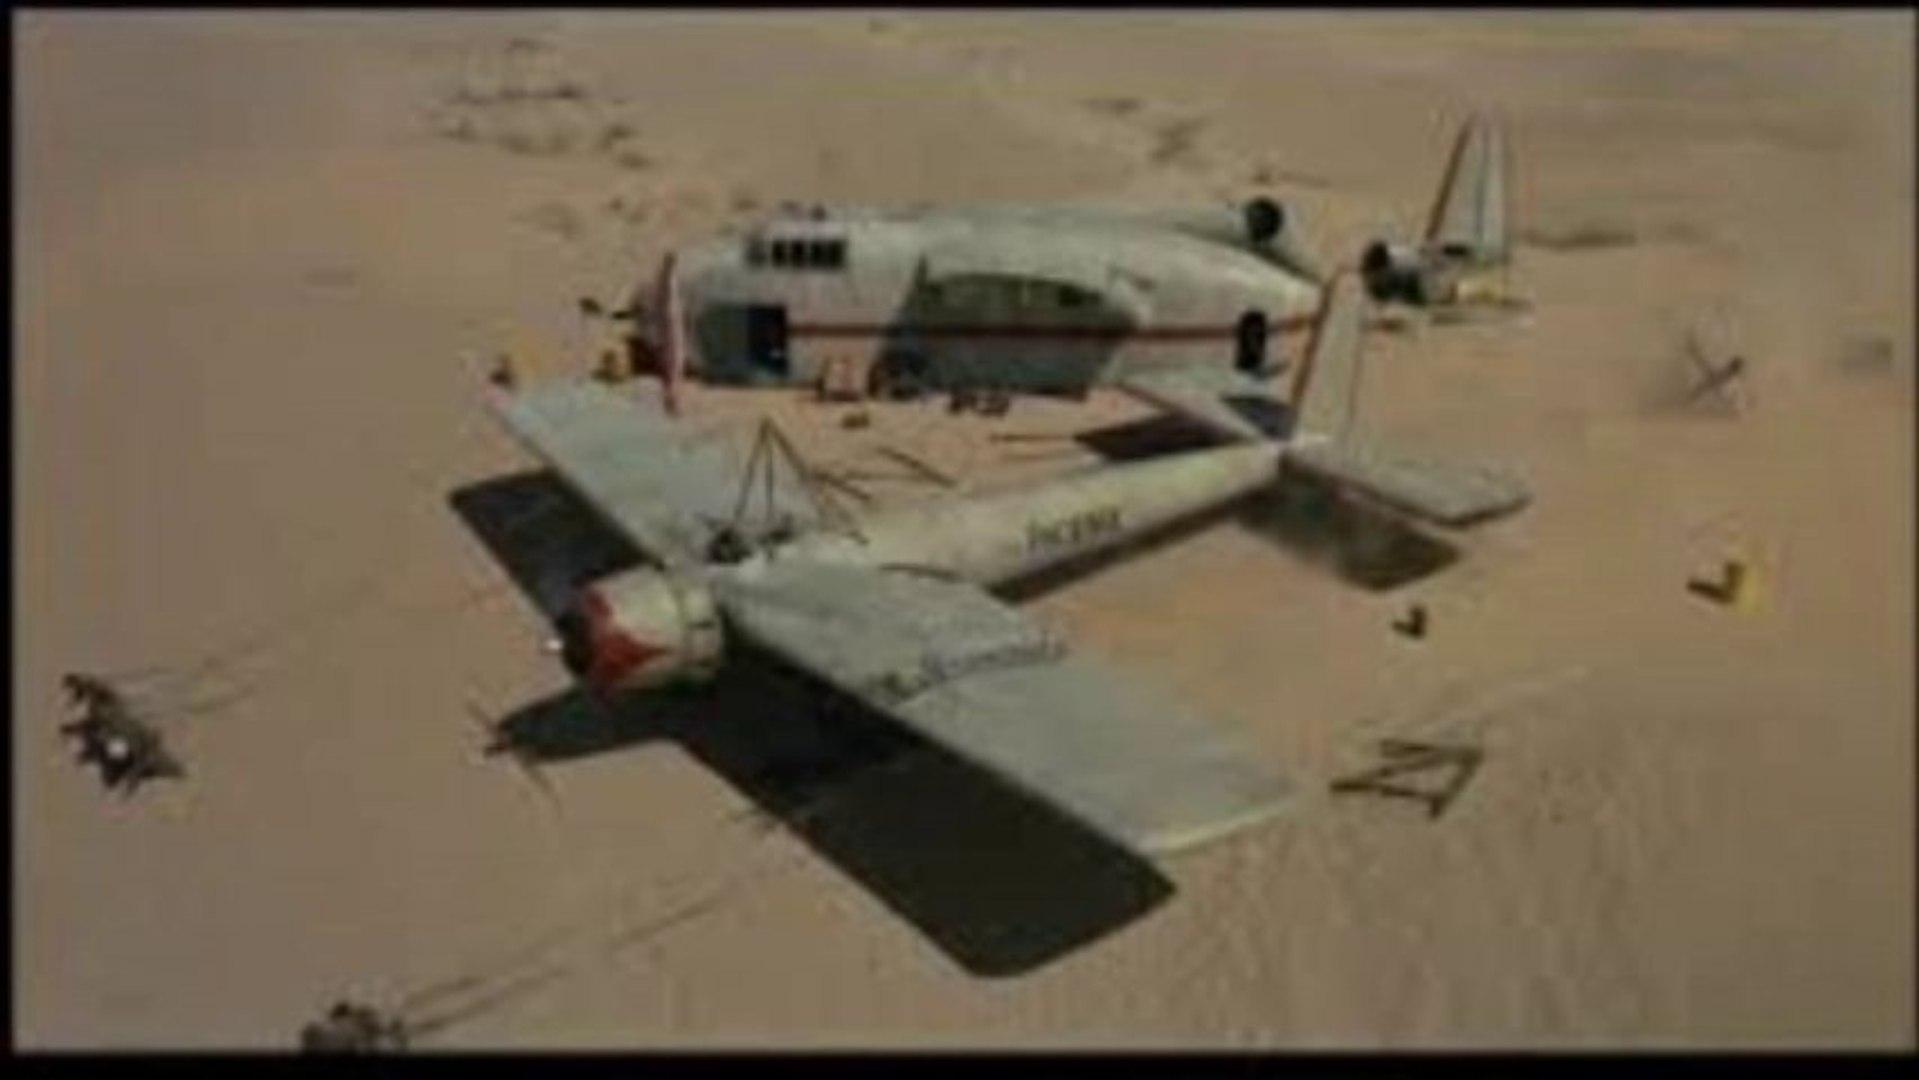 Flight Of The Phoenix (2004) full movie part 1